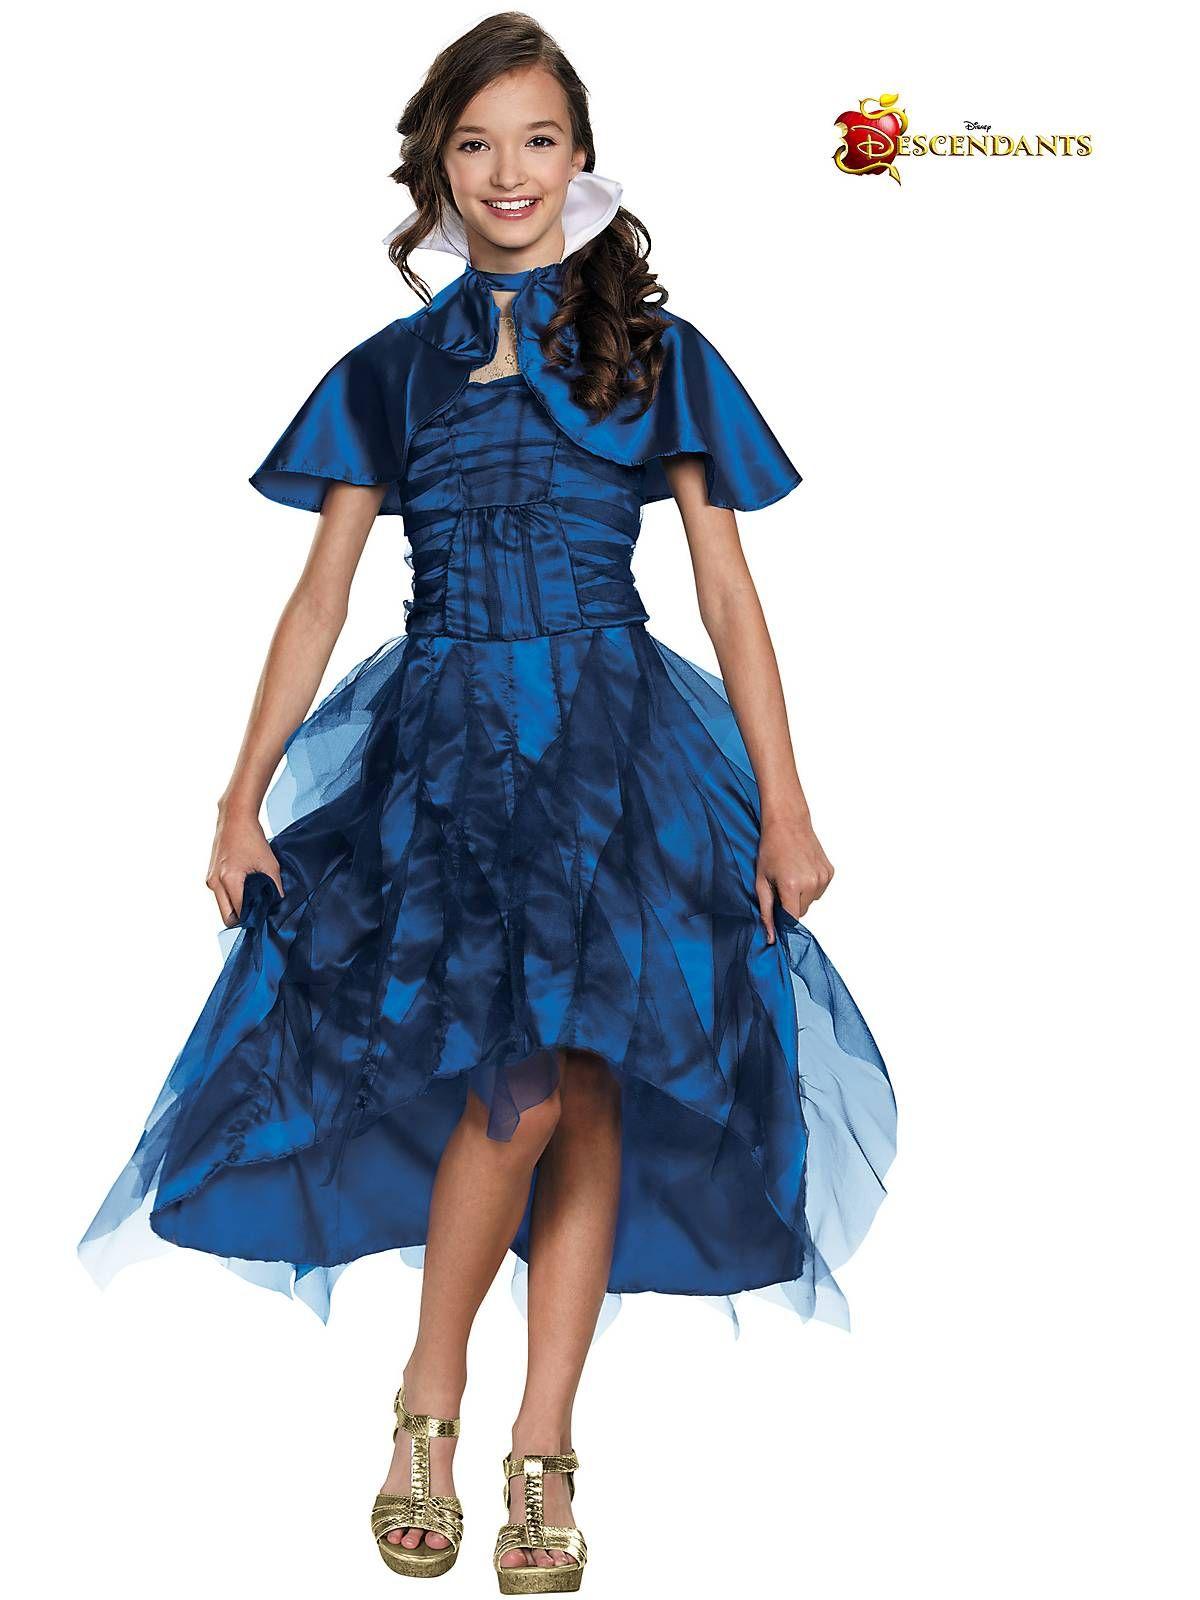 Dizzy Descendants Coronation Dress Costumes - Year of Clean